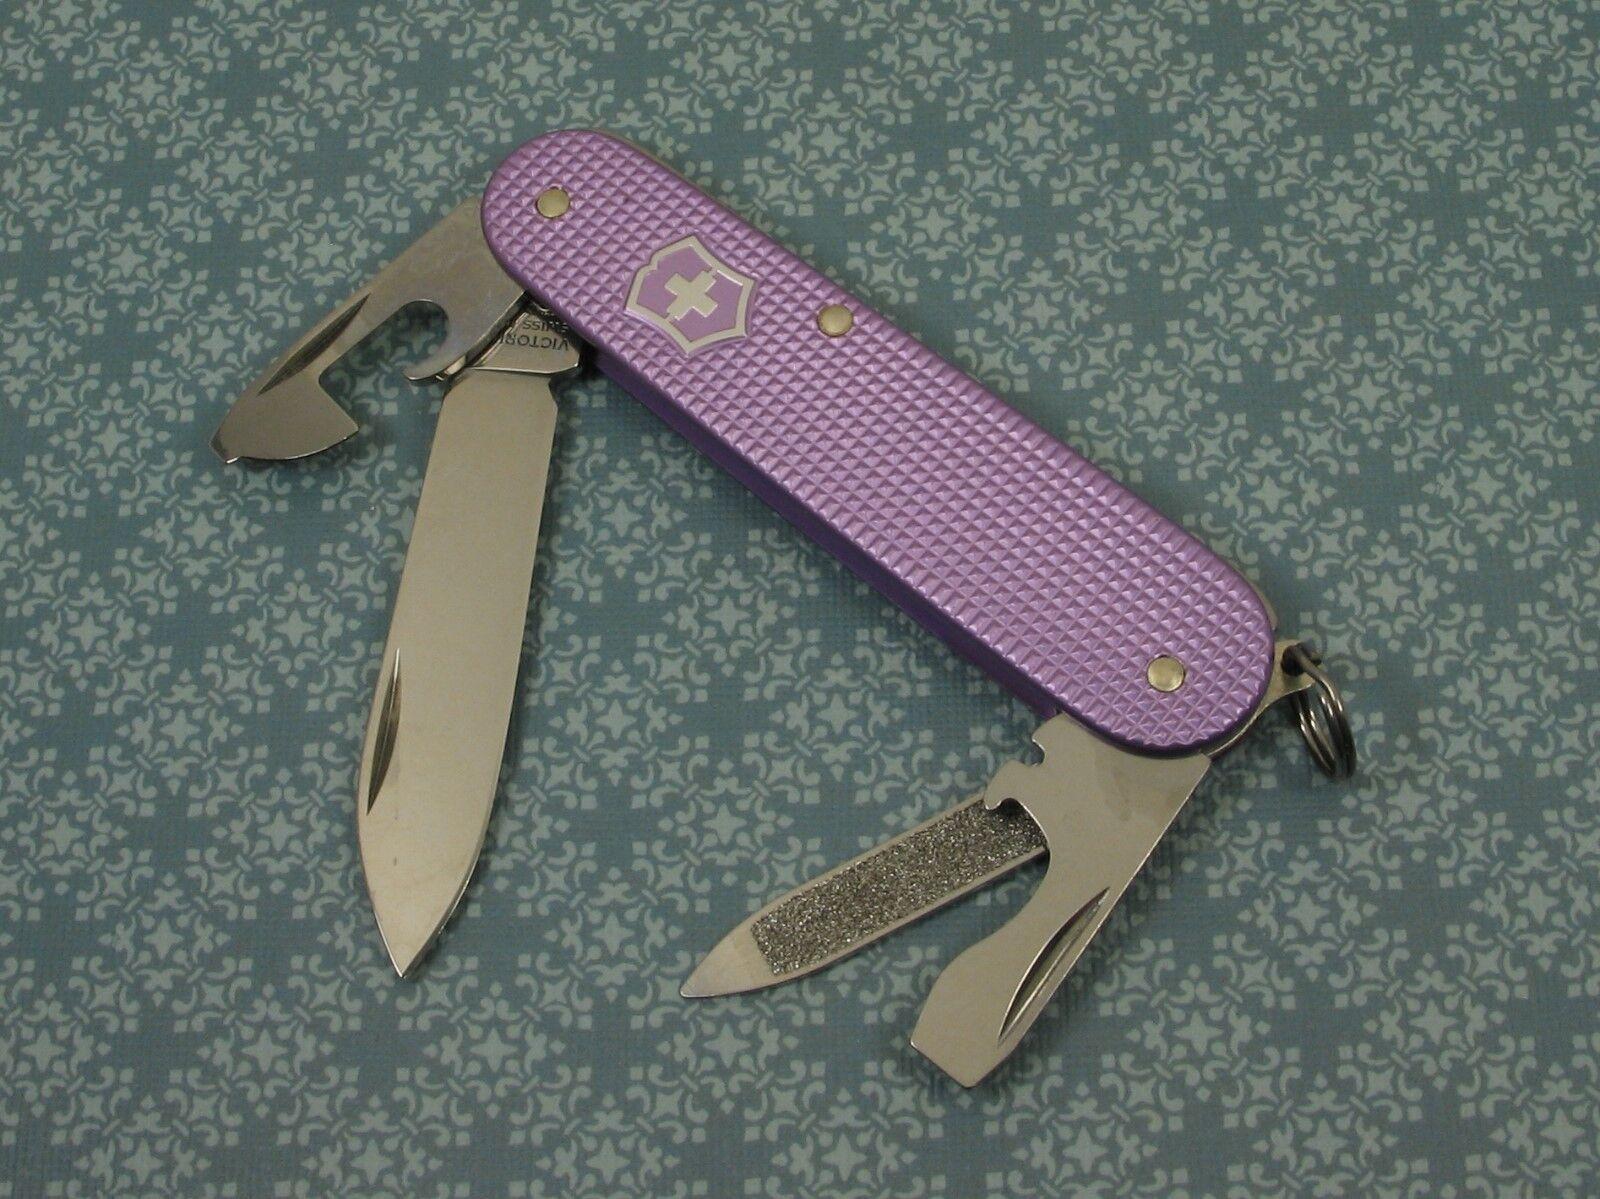 Swiss Bianco Exclusive Victorinox Cadet Lavender Alox Swiss Army Knife